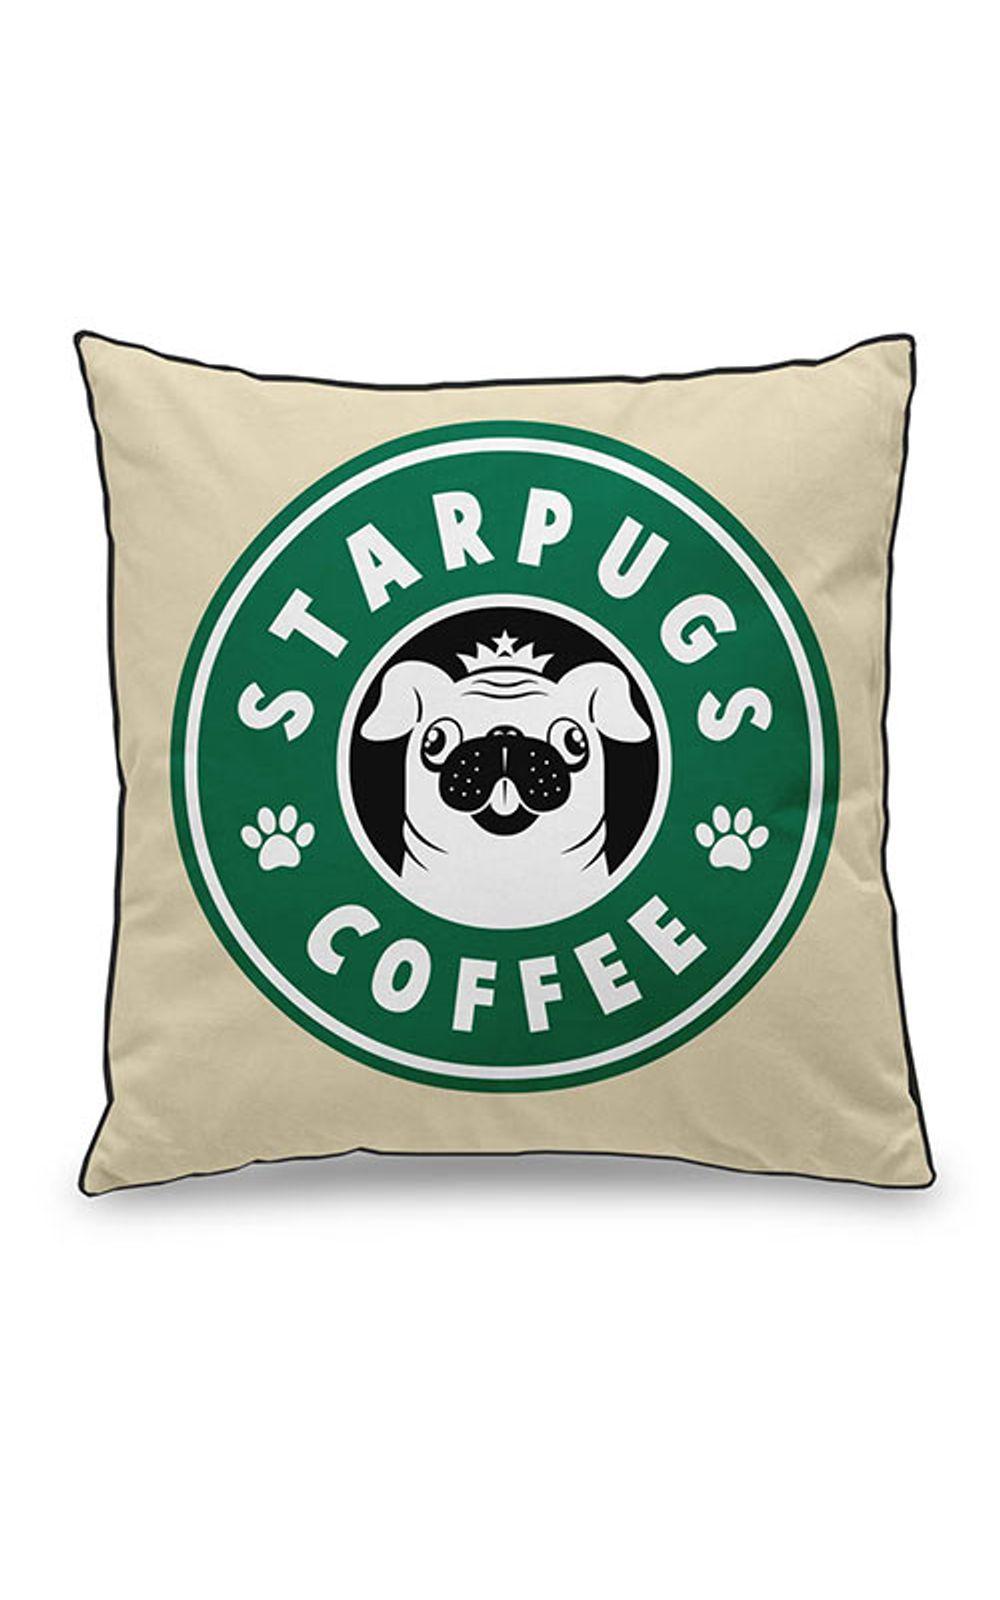 Foto 1 - Almofada Cachorro Pug Starbucks